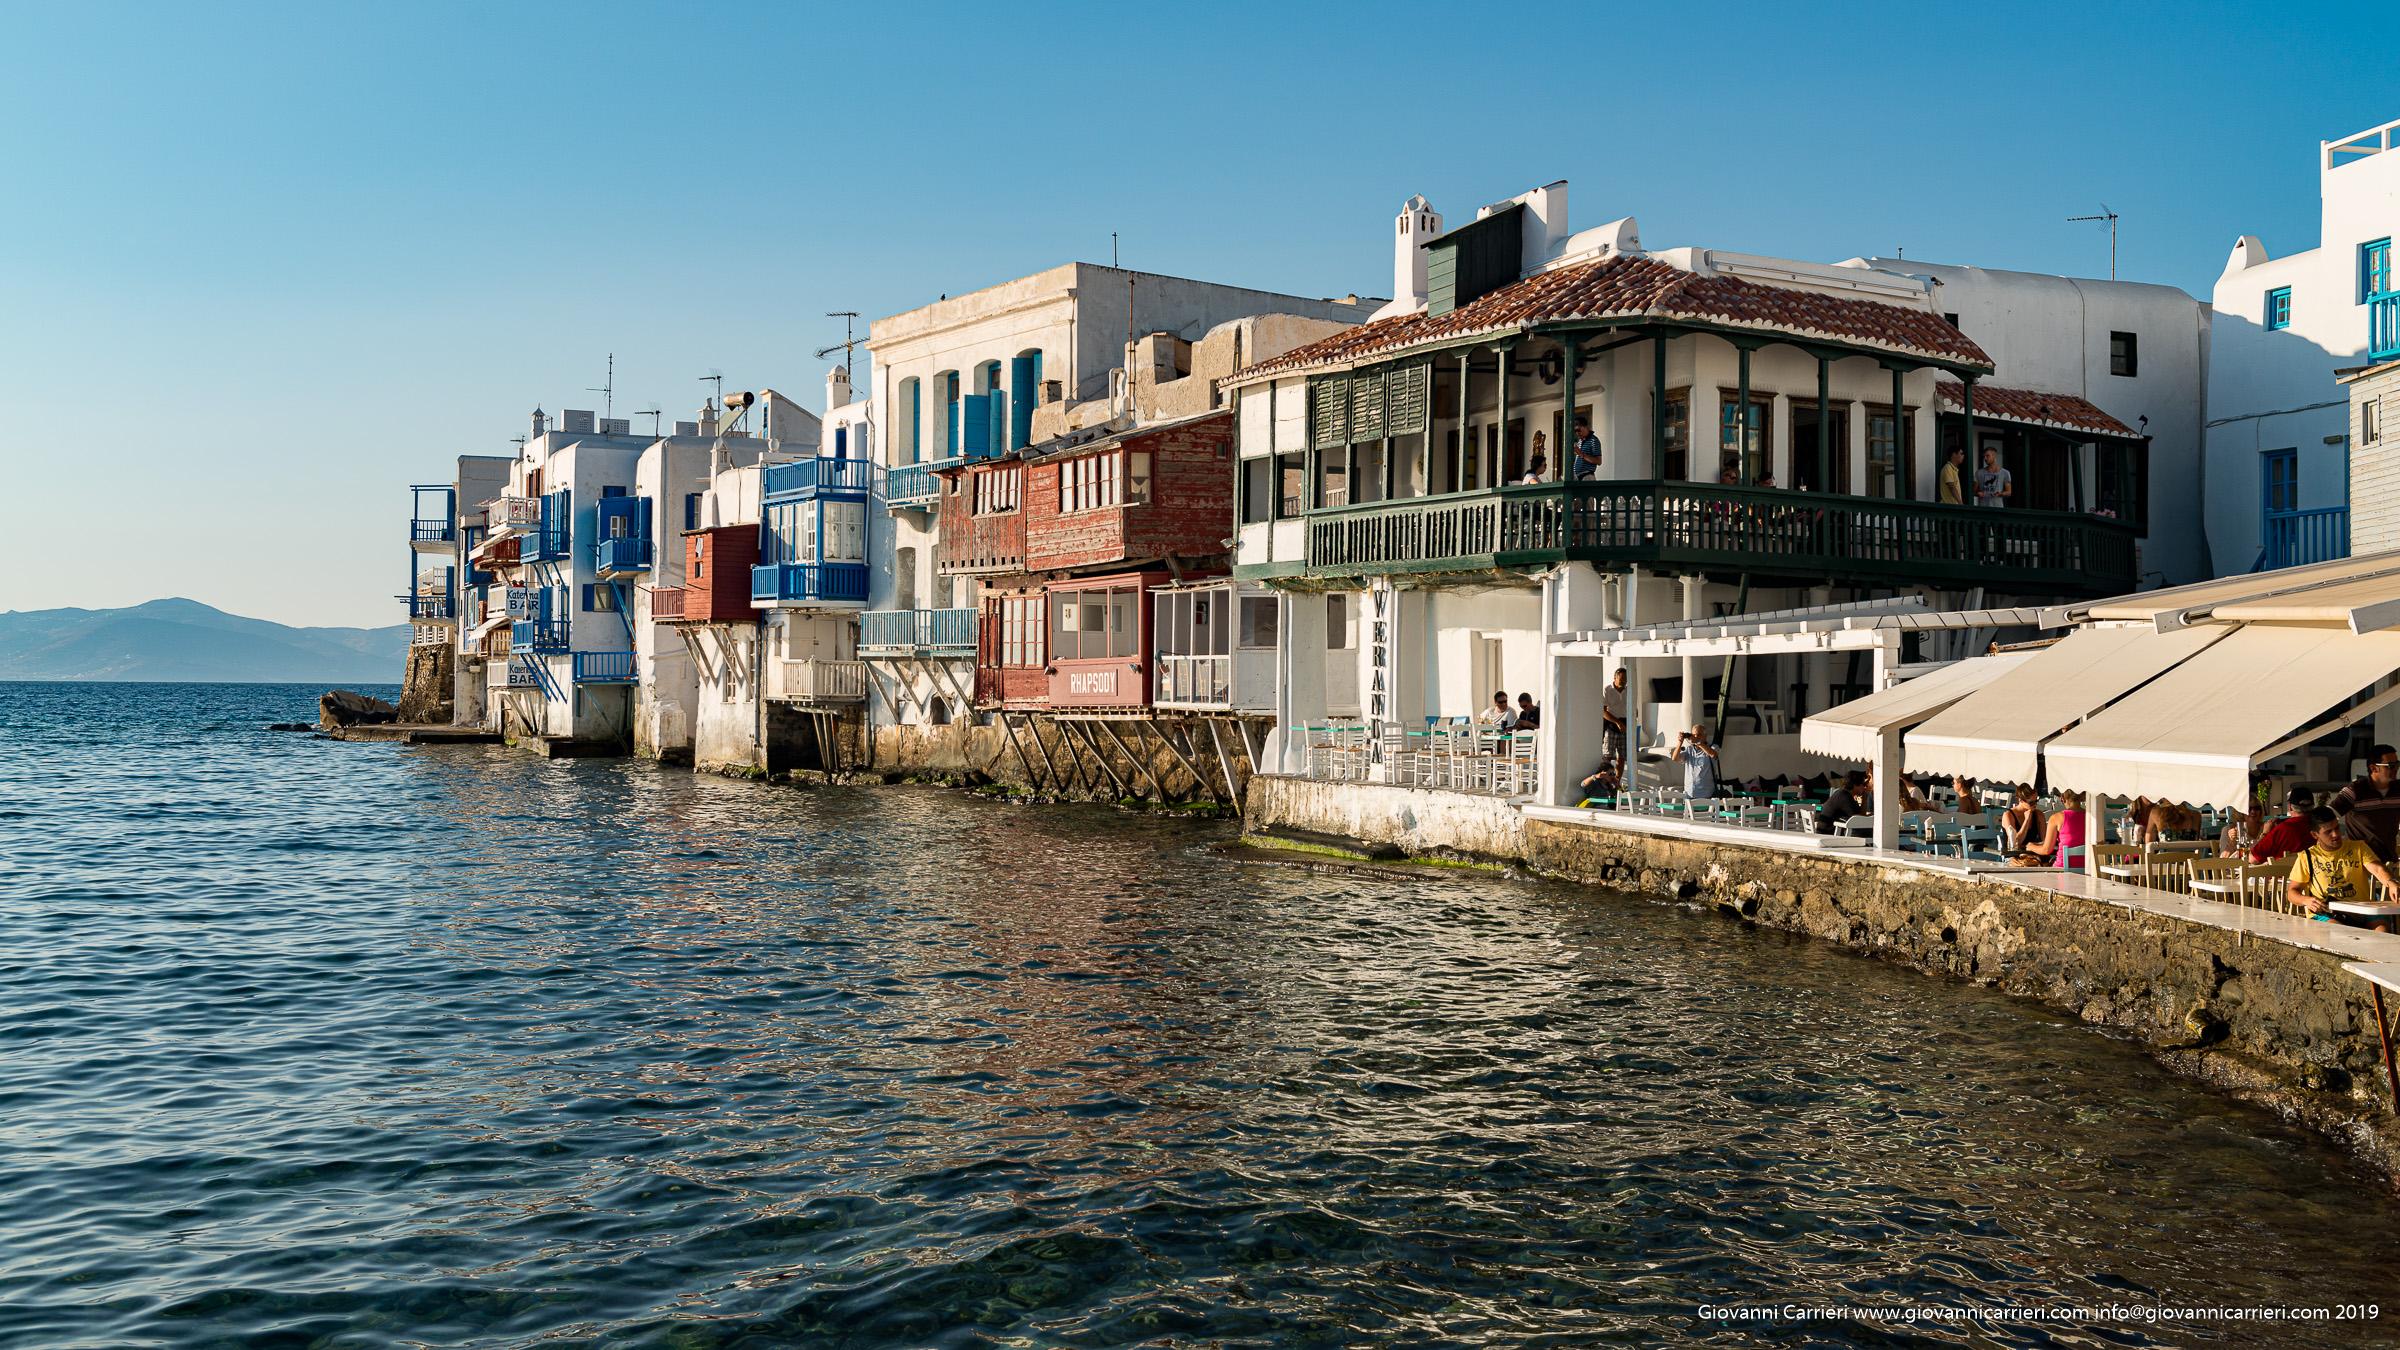 The little Venice of Chora - Mykonos